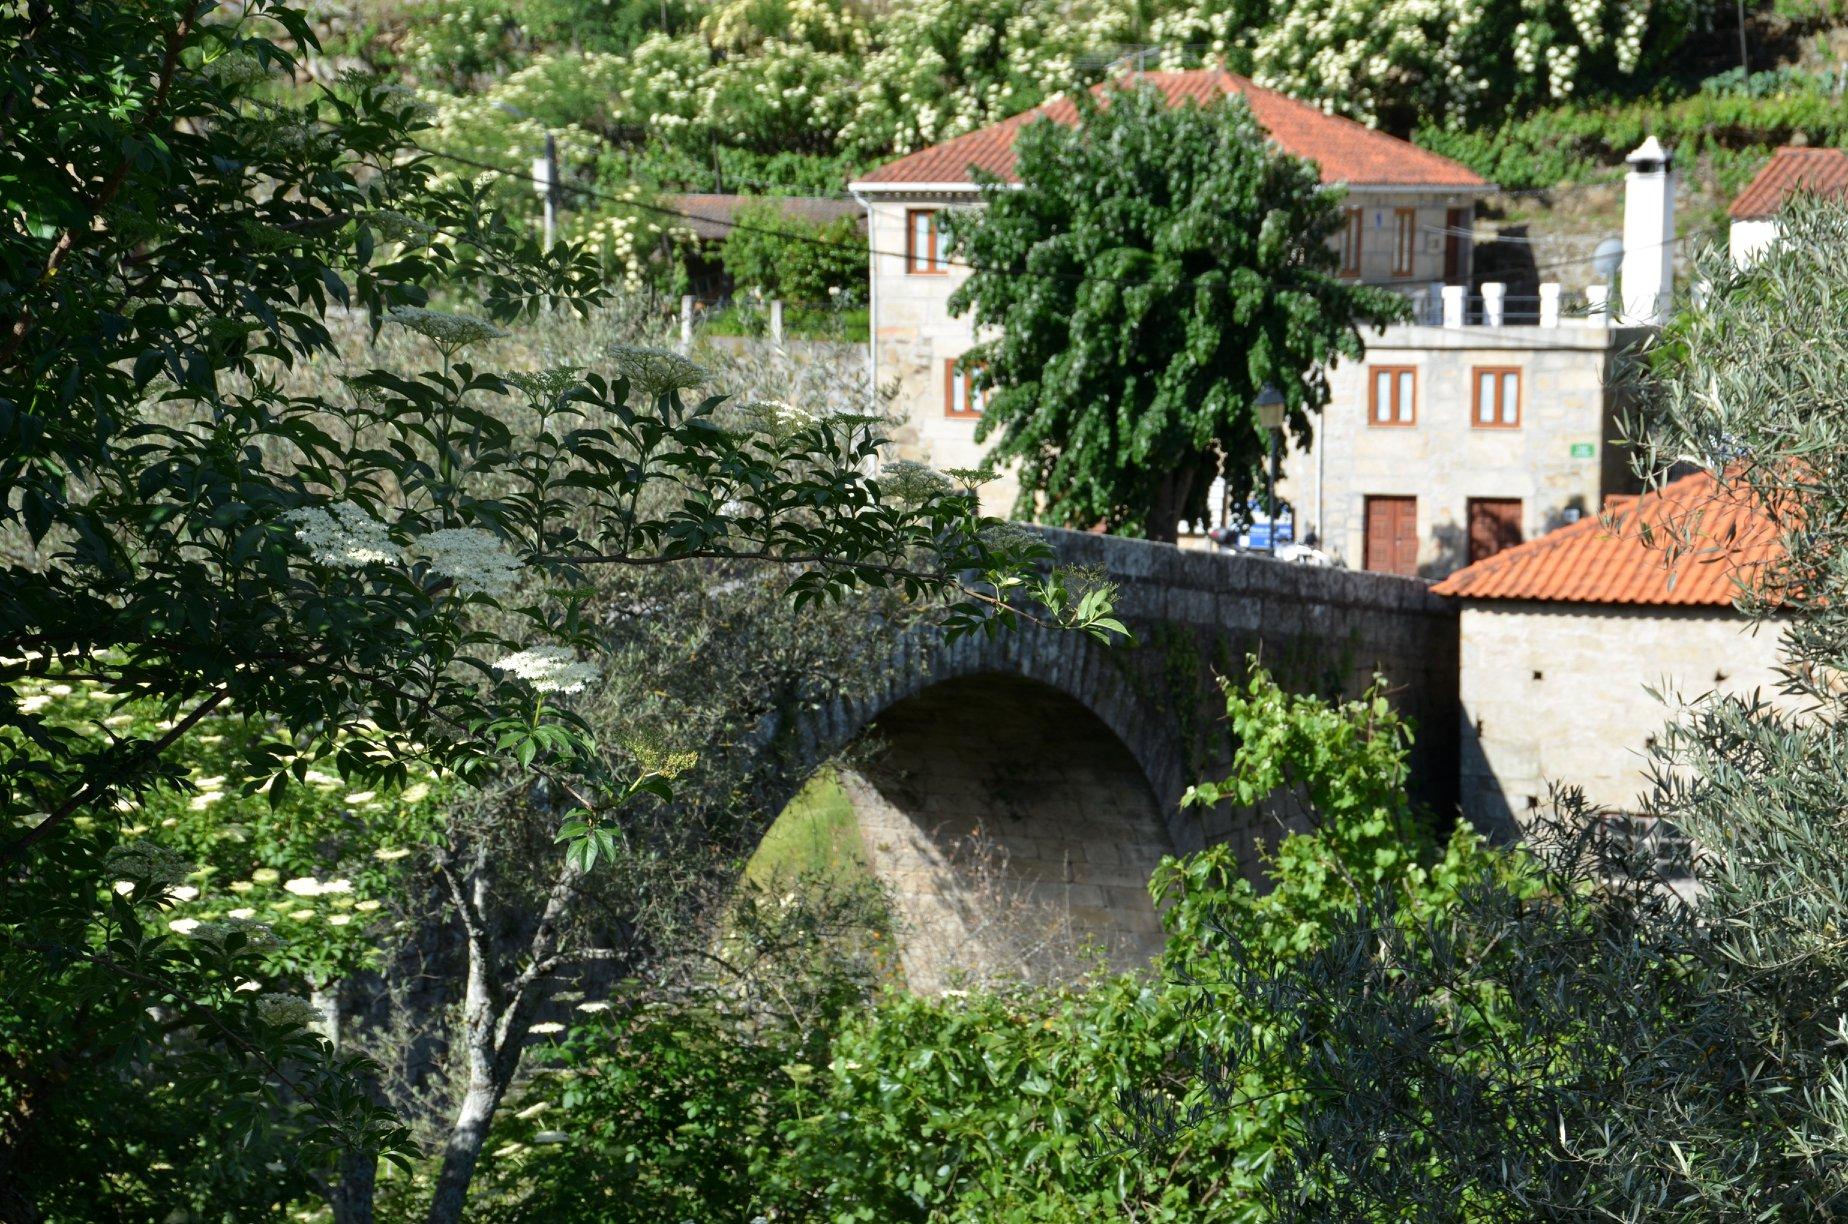 Crossing over Granja's Roman bridge.